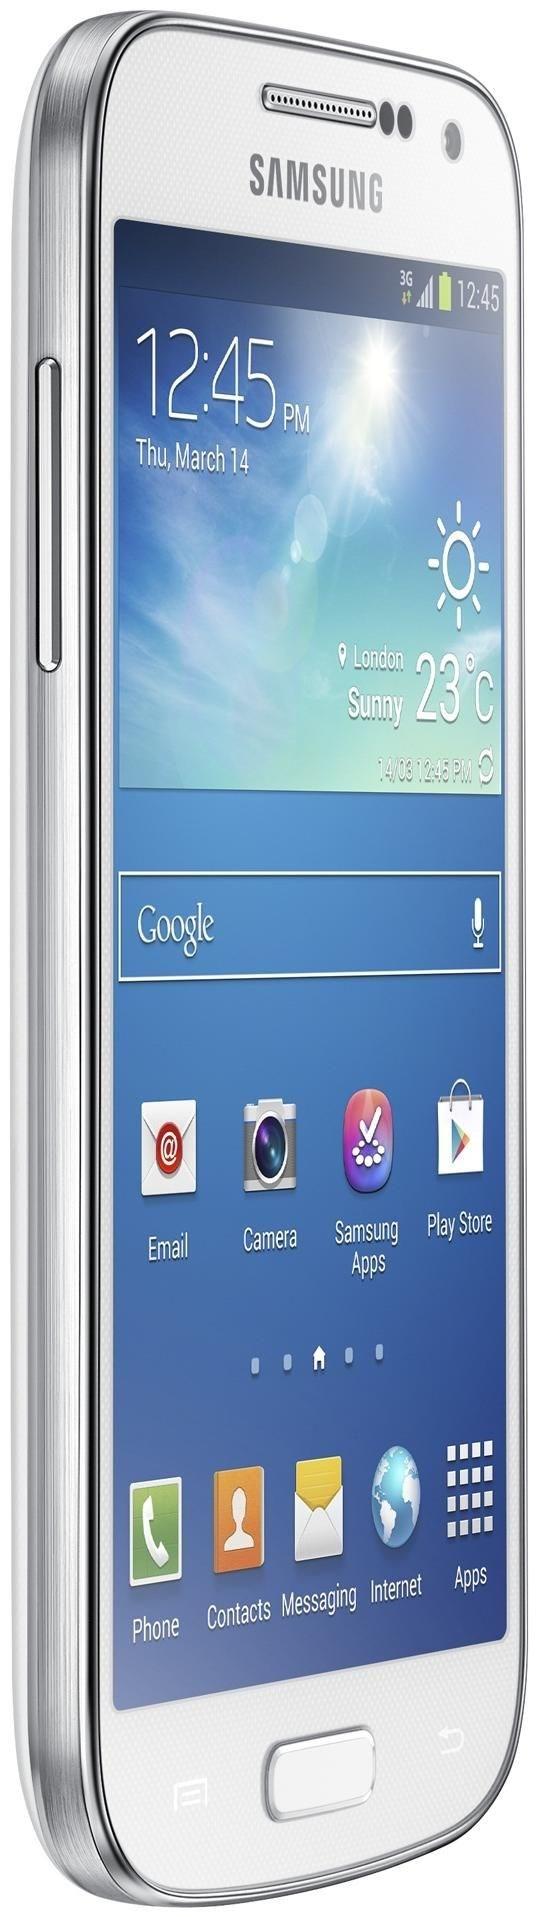 Samsung Galaxy S4 Mini i9195, 8 GB, Smartphone ohne Vertrag/SIMlock, weiß GT-I9195ZWADBT